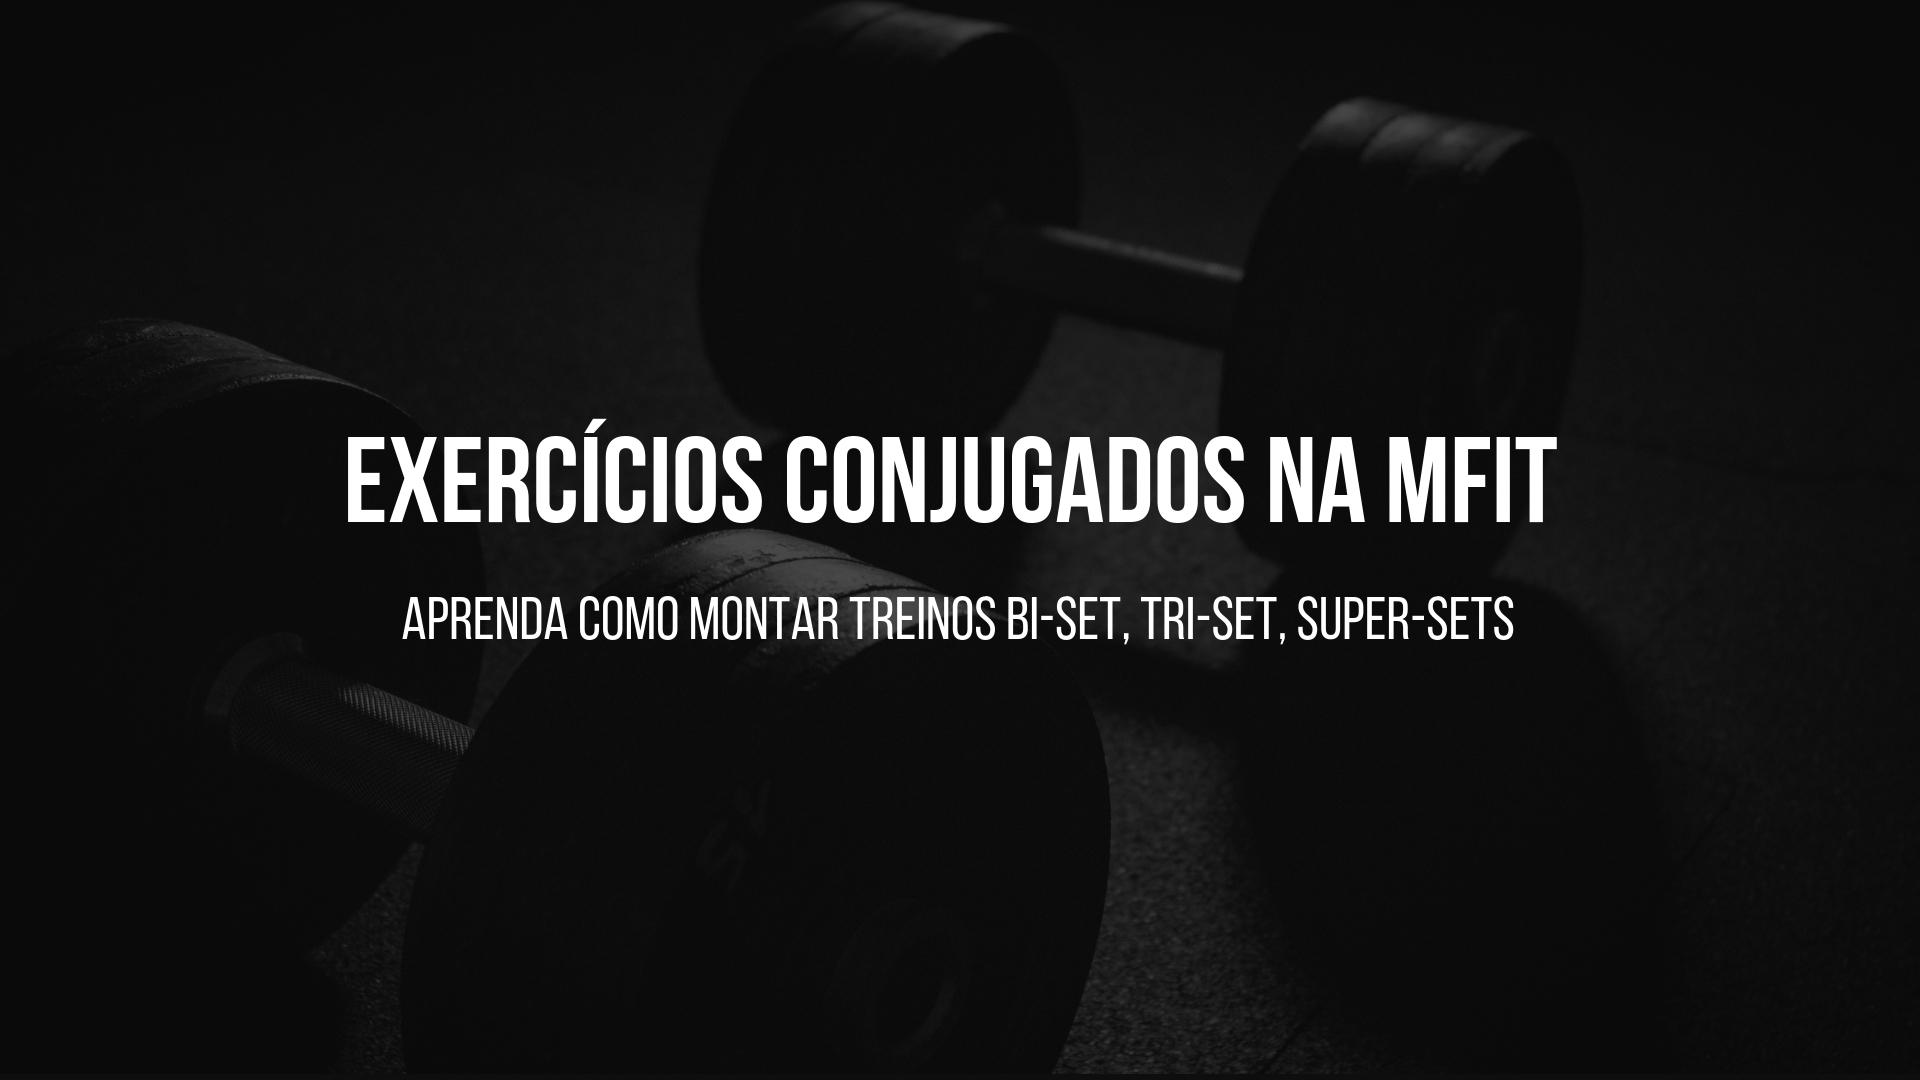 Exercícios conjugados na MFIT